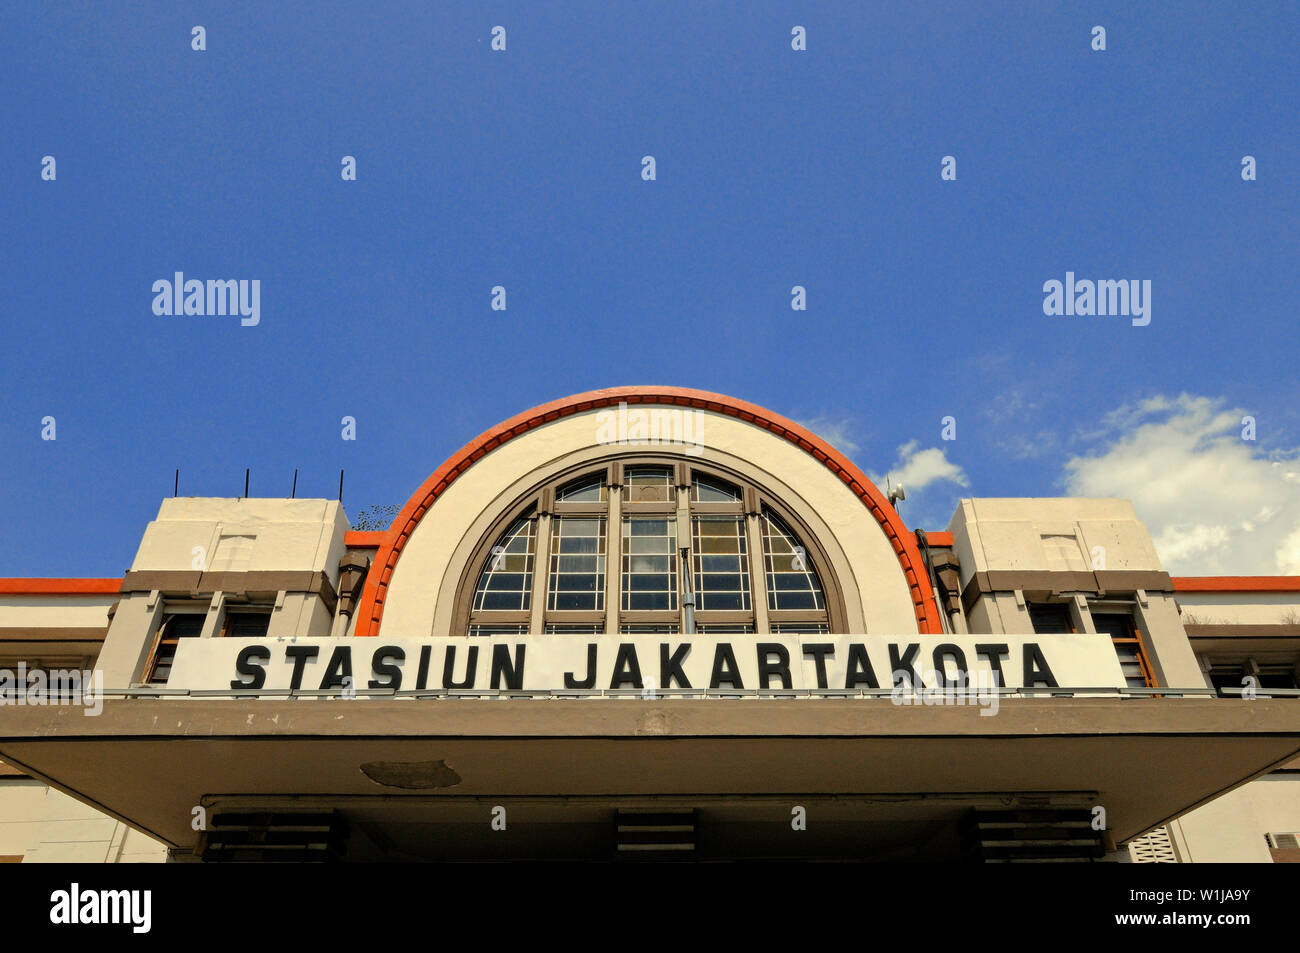 jakarta, dki jakarta/indonesia - may 18, 2010: front facade of the historical kota railway station - Stock Image